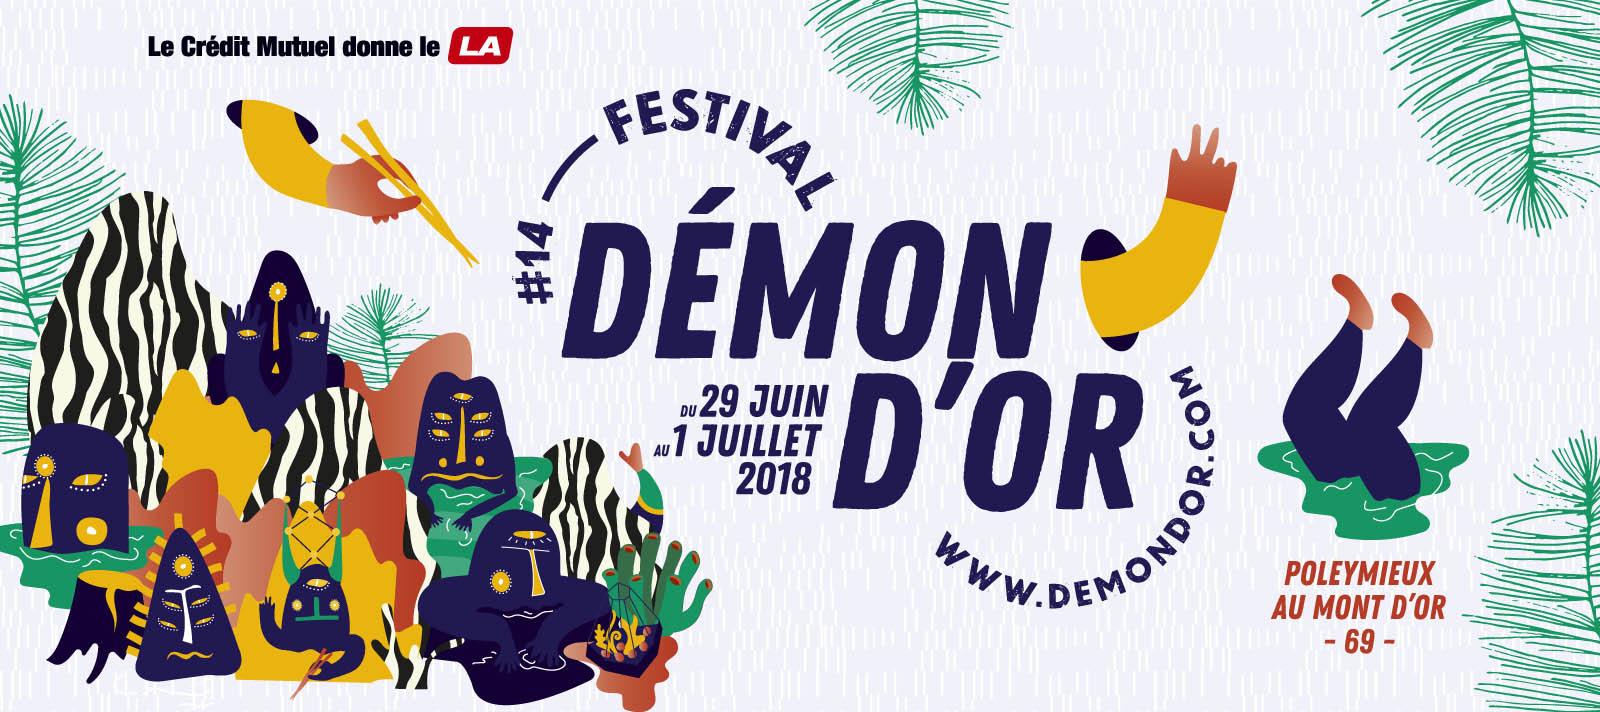 Demon-or-festival-juillet-2018